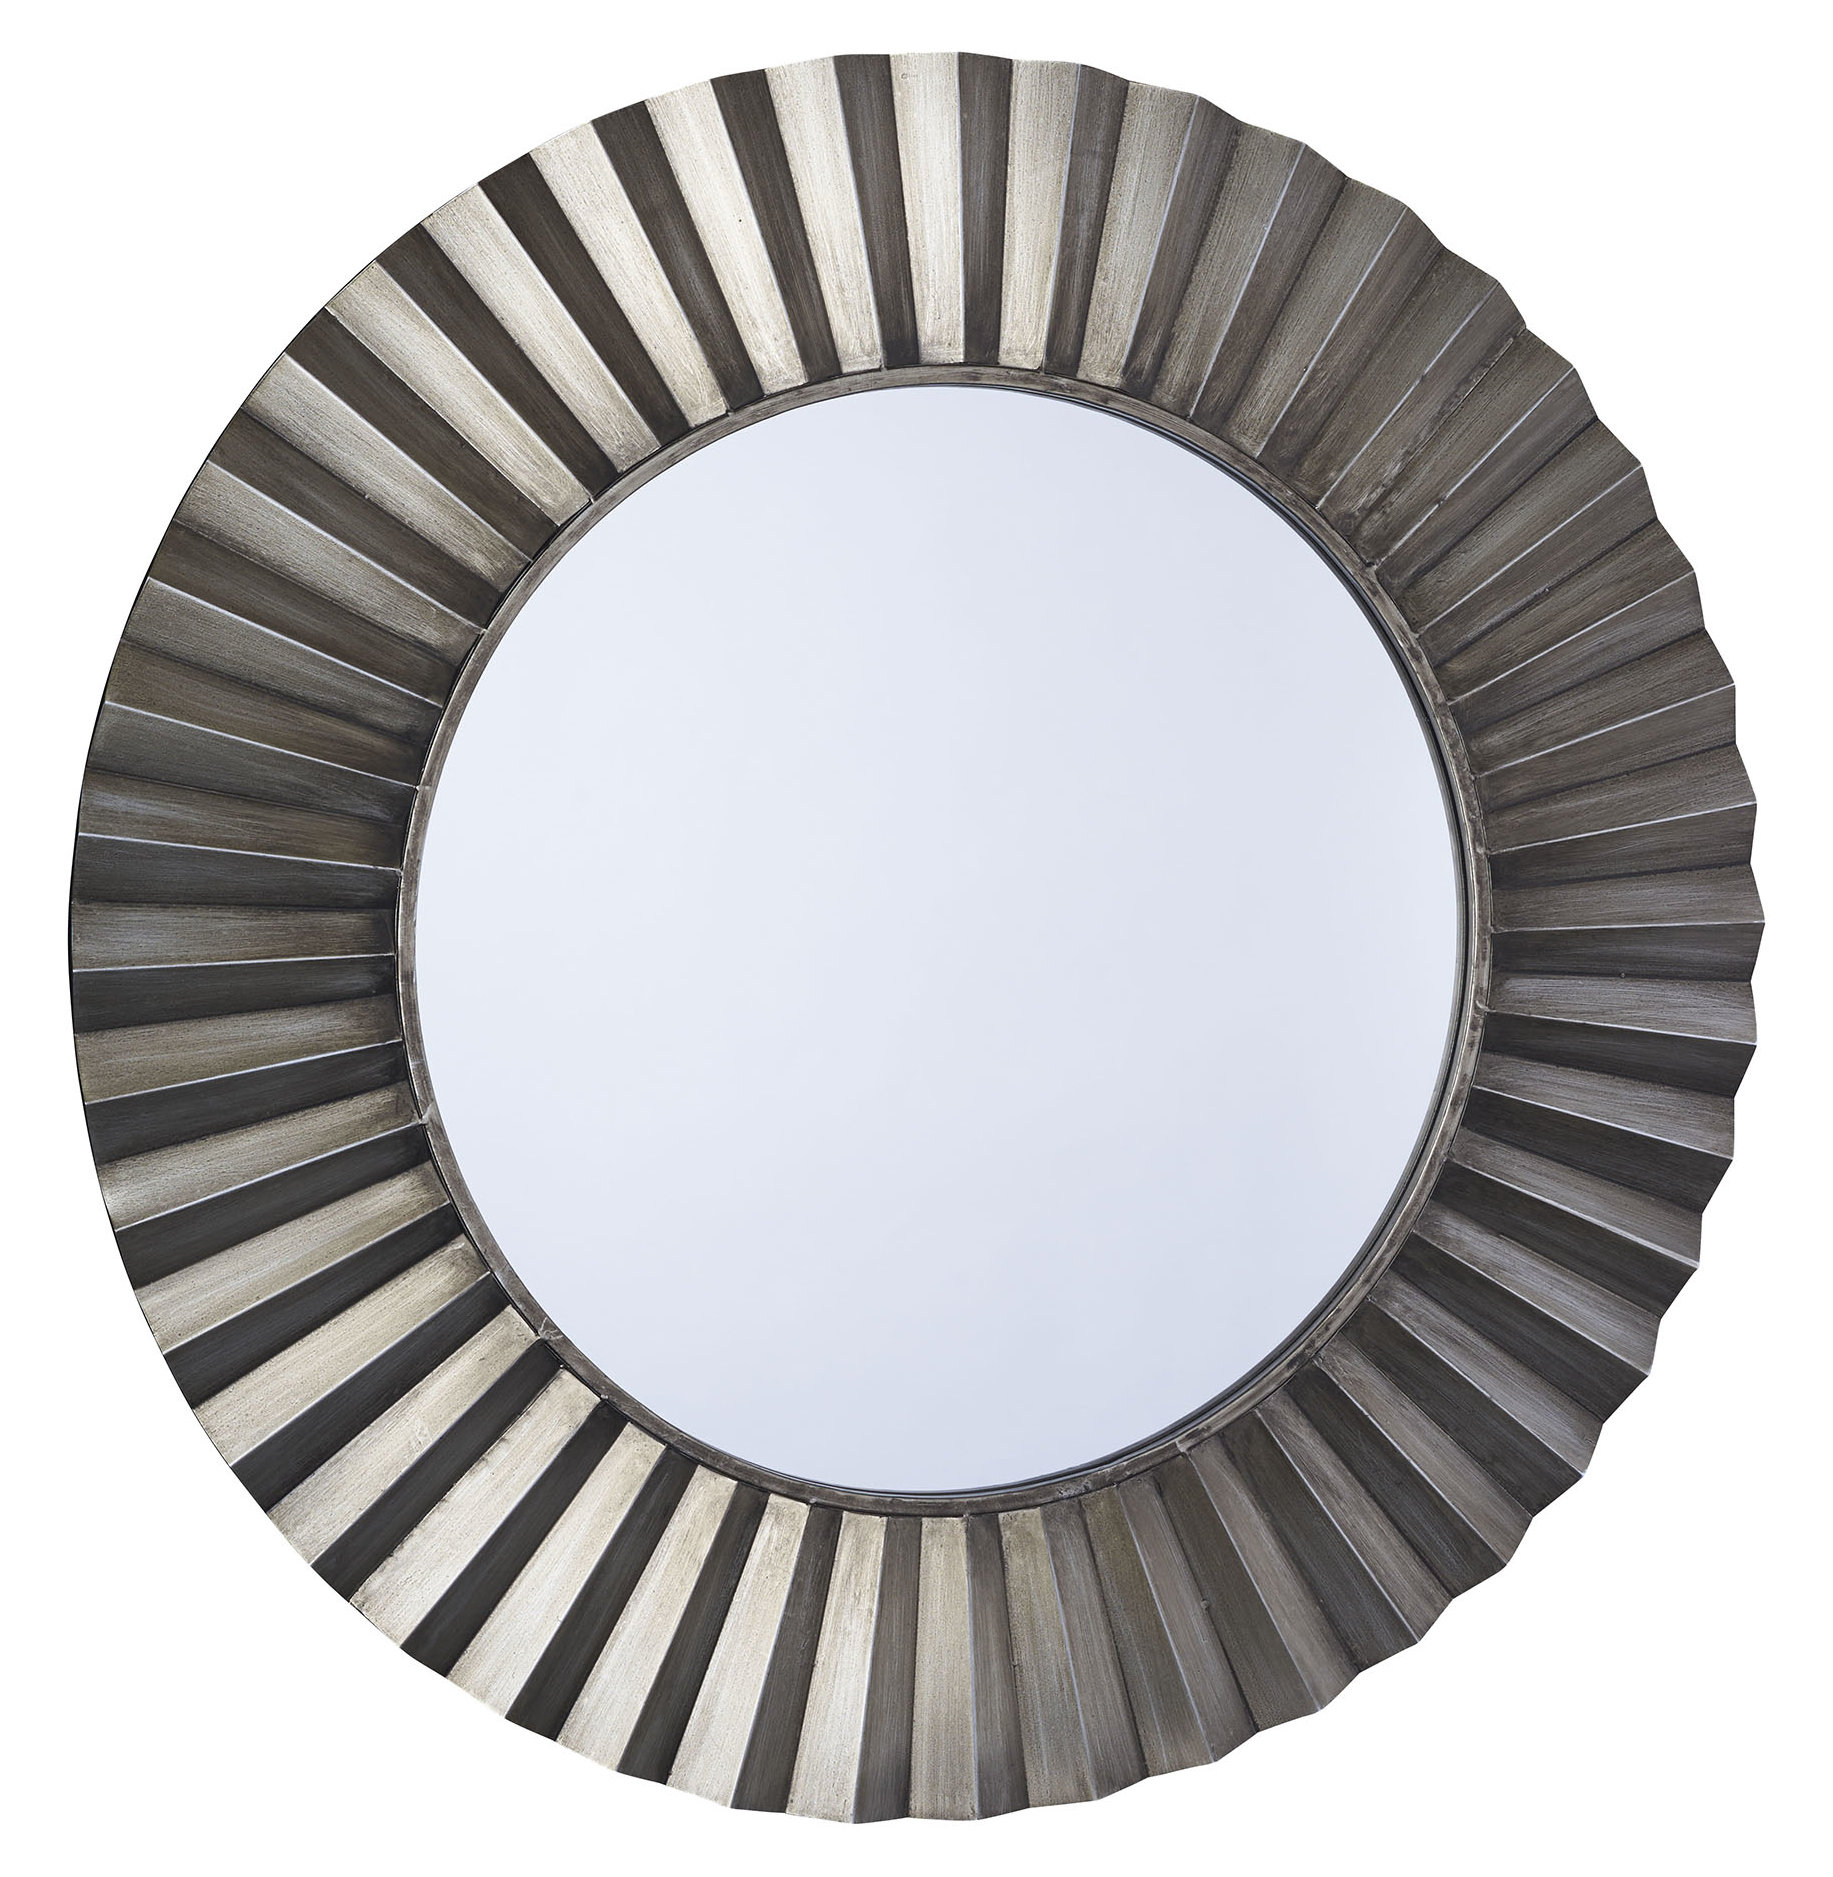 Sunburst Round Wall Mirror For Point Reyes Molten Round Wall Mirrors (Image 17 of 20)